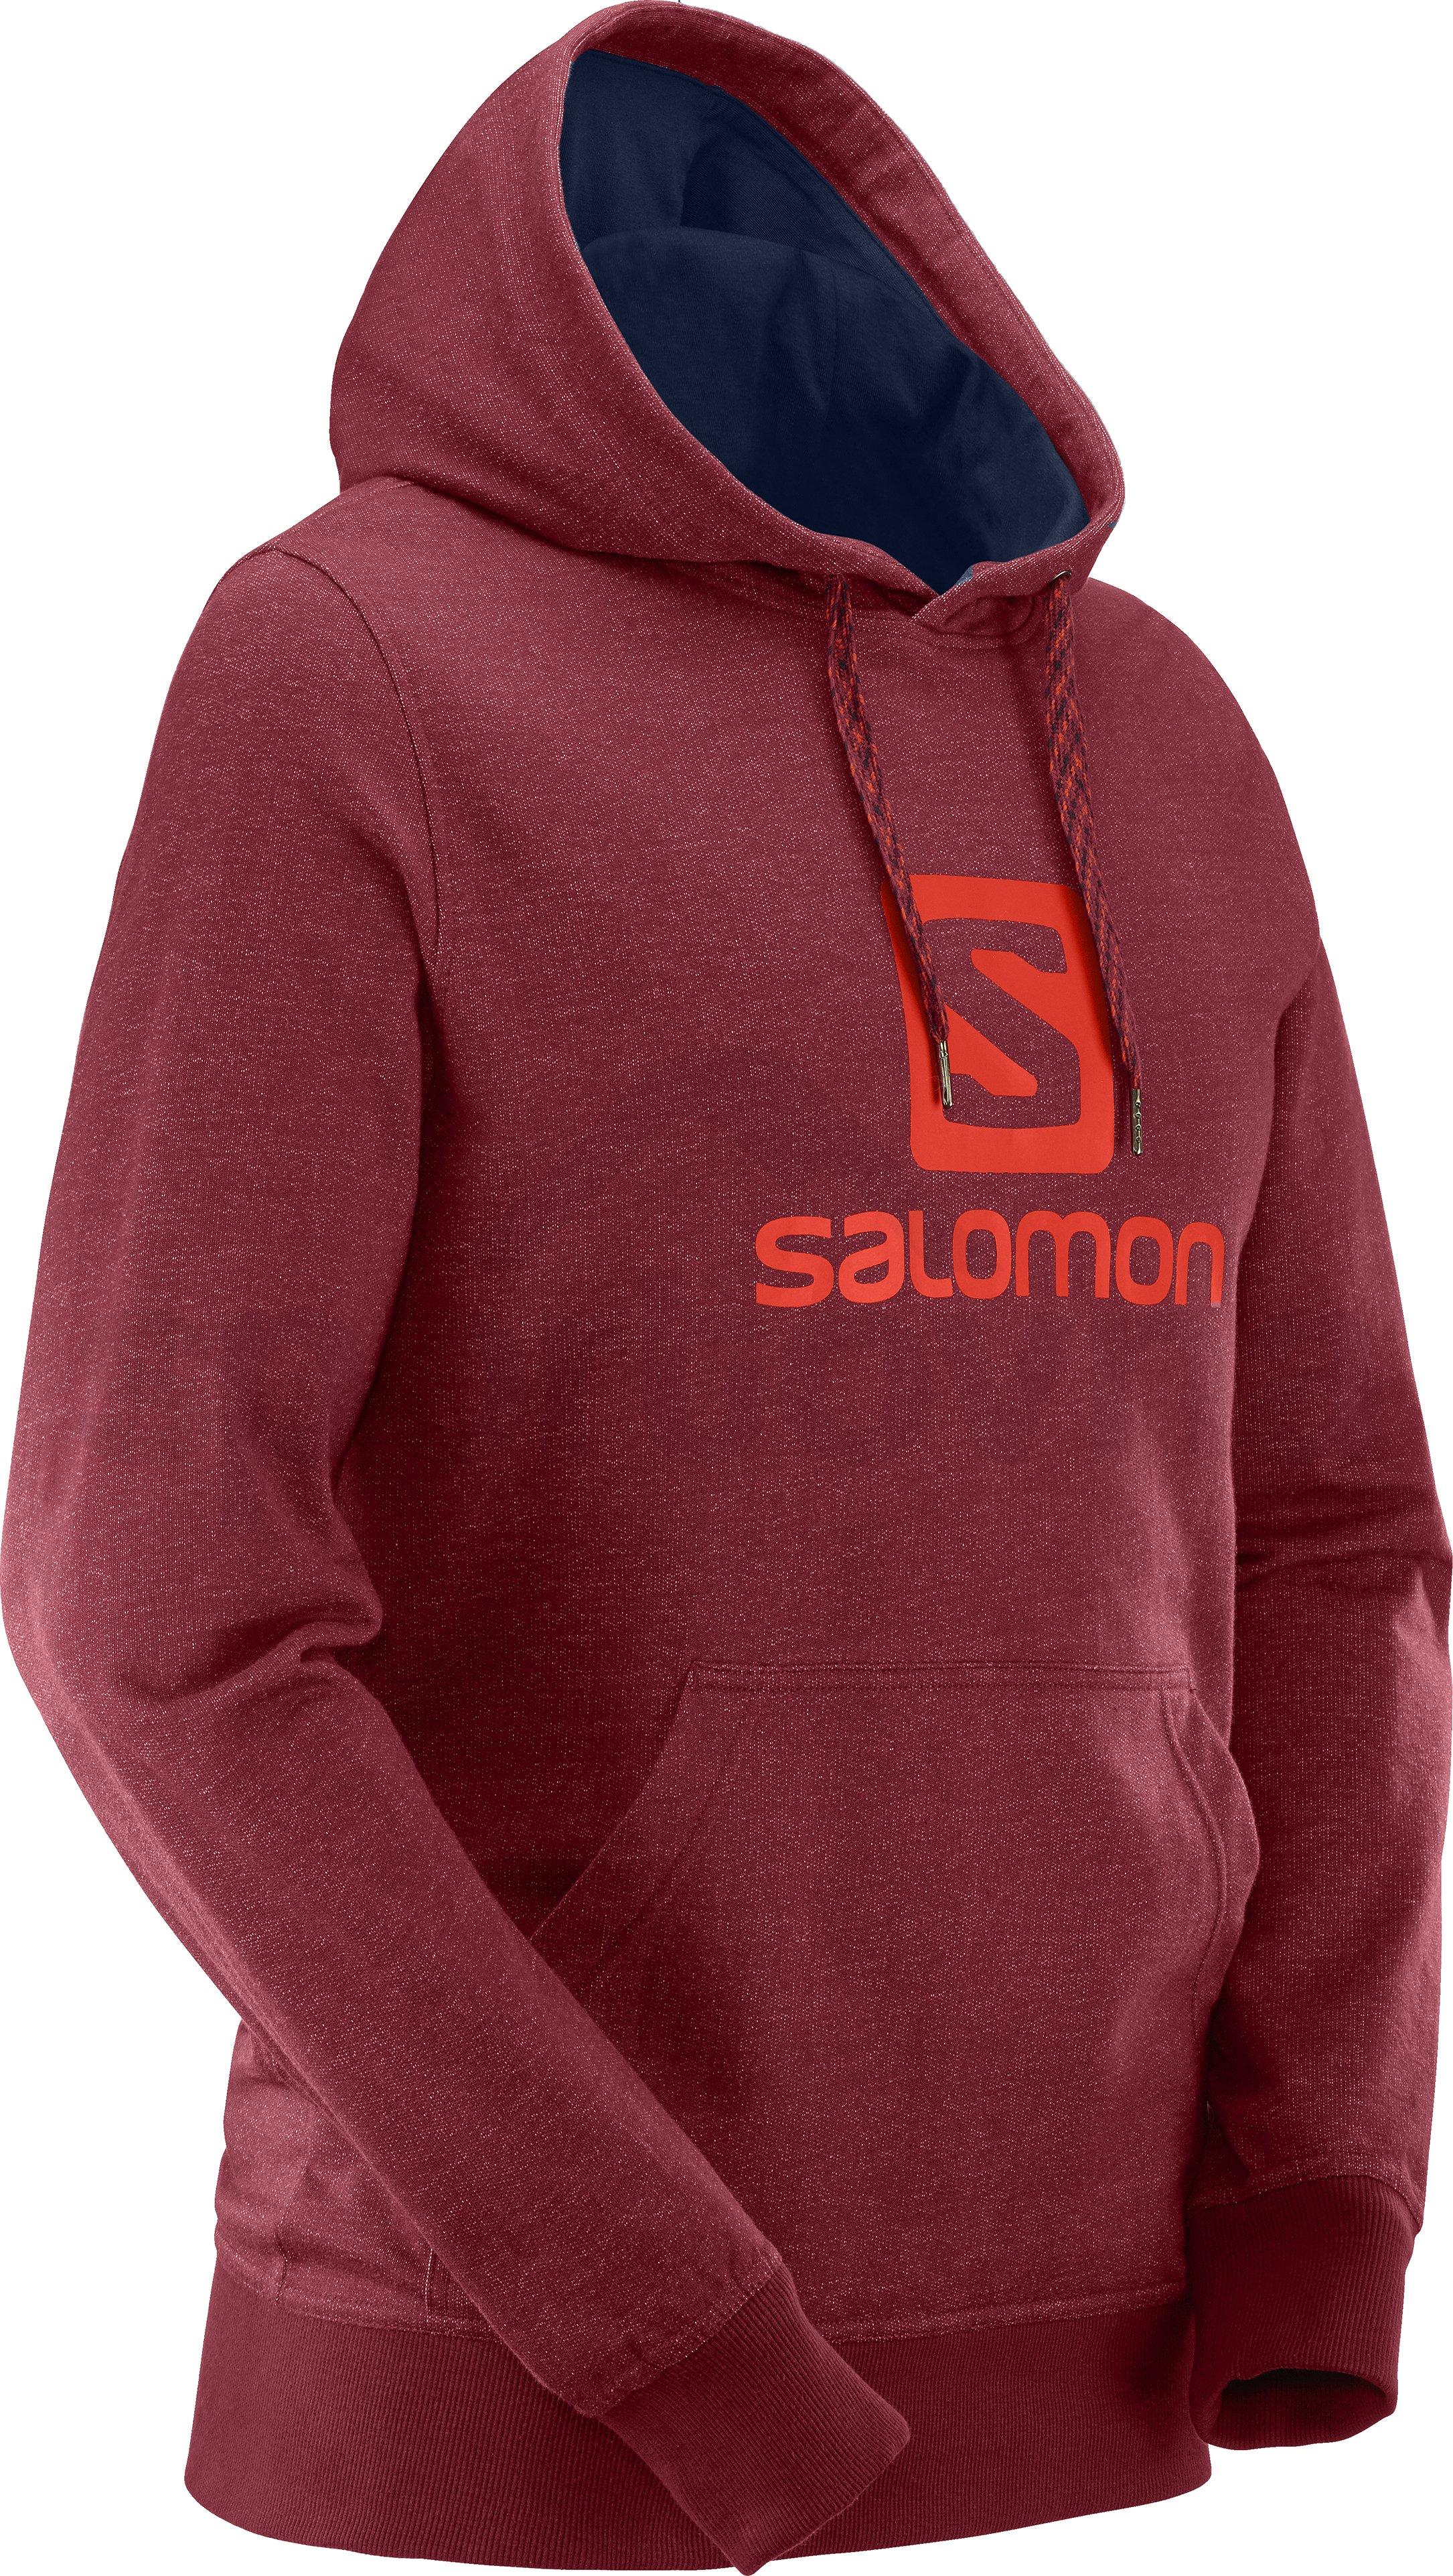 72f12cf2cd Pánská sportovní mikina Salomon LOGO HOODIE M Biking Red - LC1053300 ...